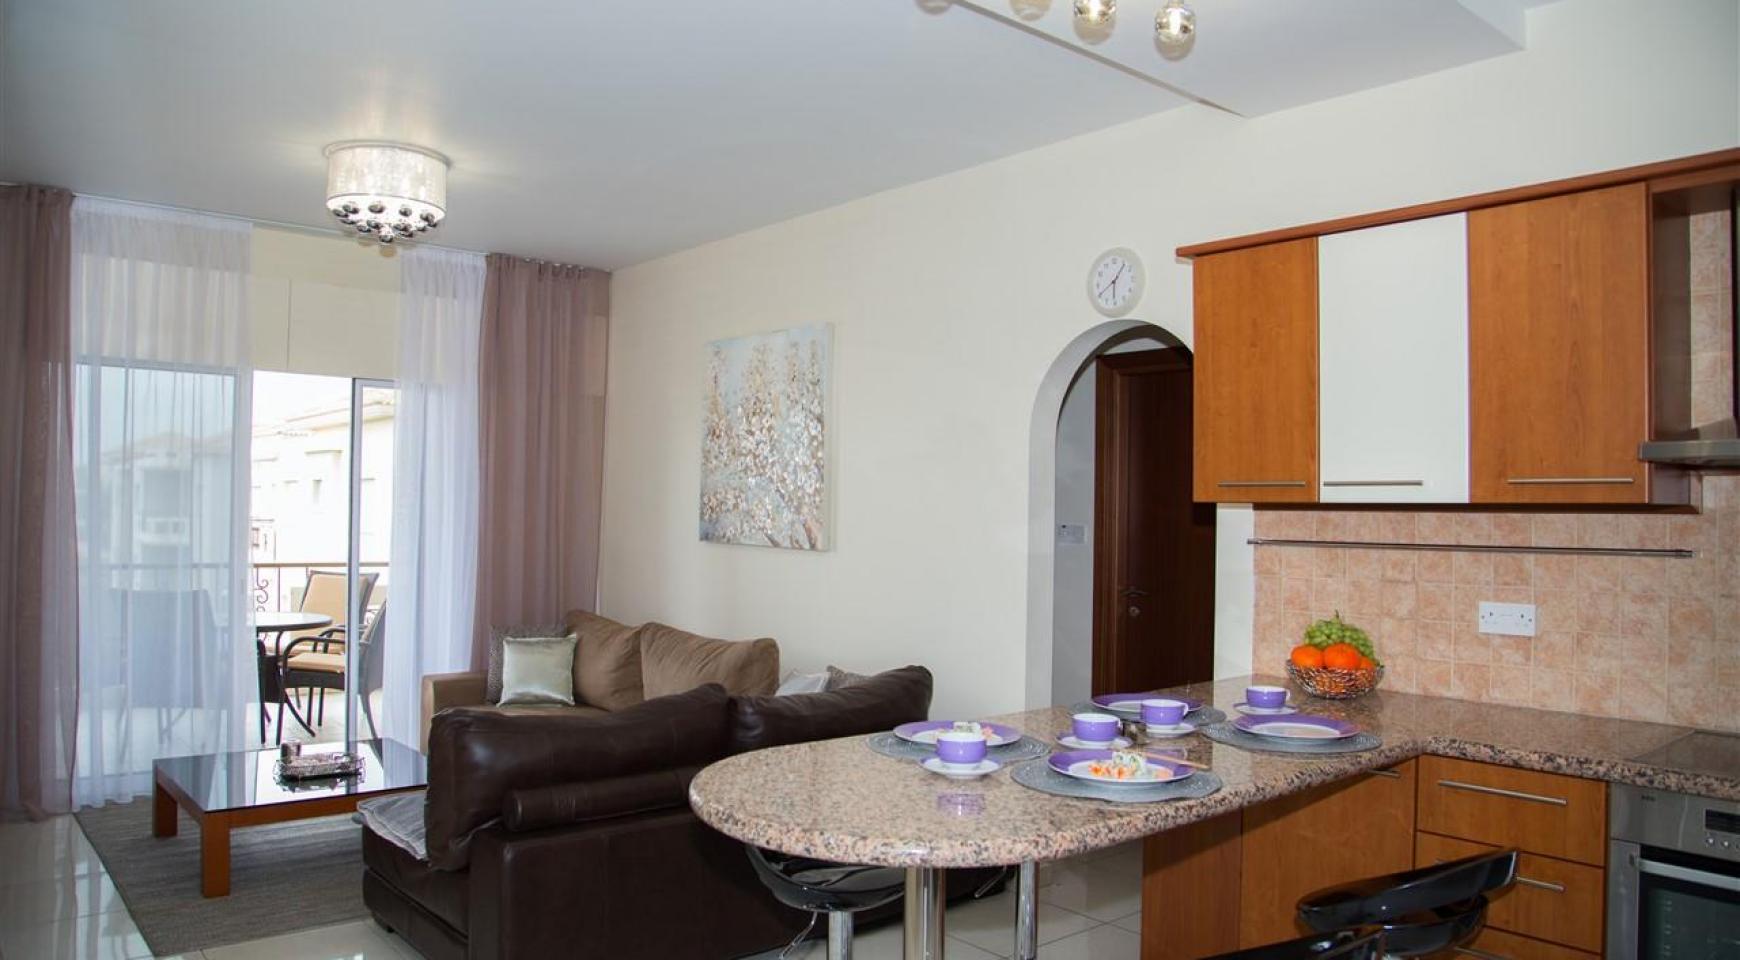 Luxury 2 Bedroom Apartment Mesogios Iris 304 in the Tourist area near the Beach - 2